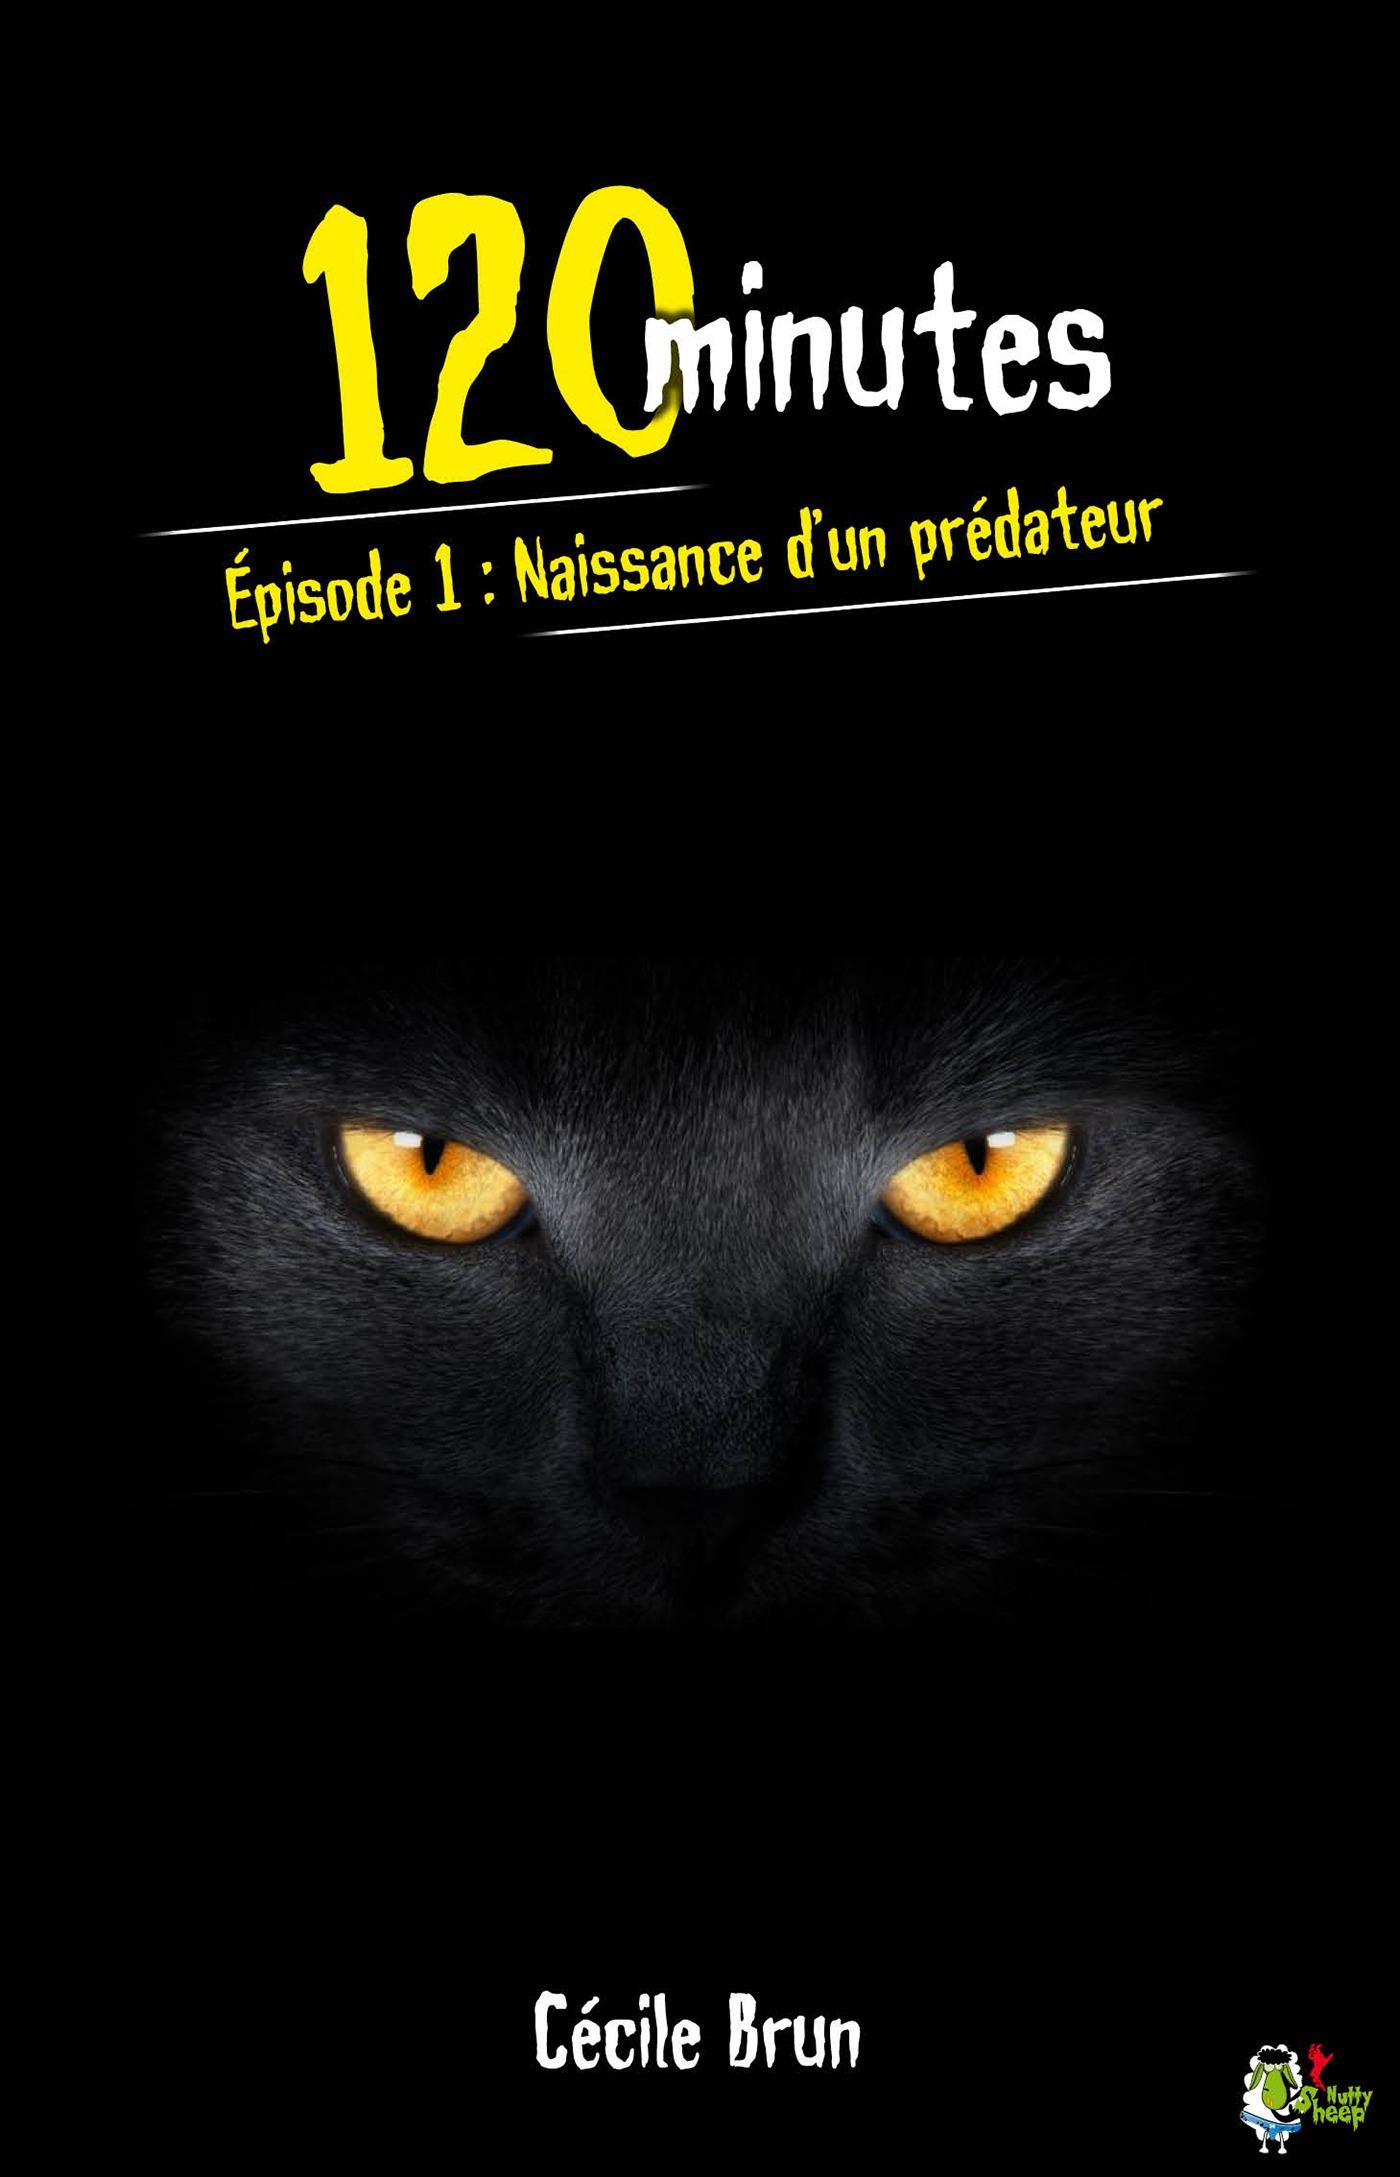 120 minutes, Épisode 1